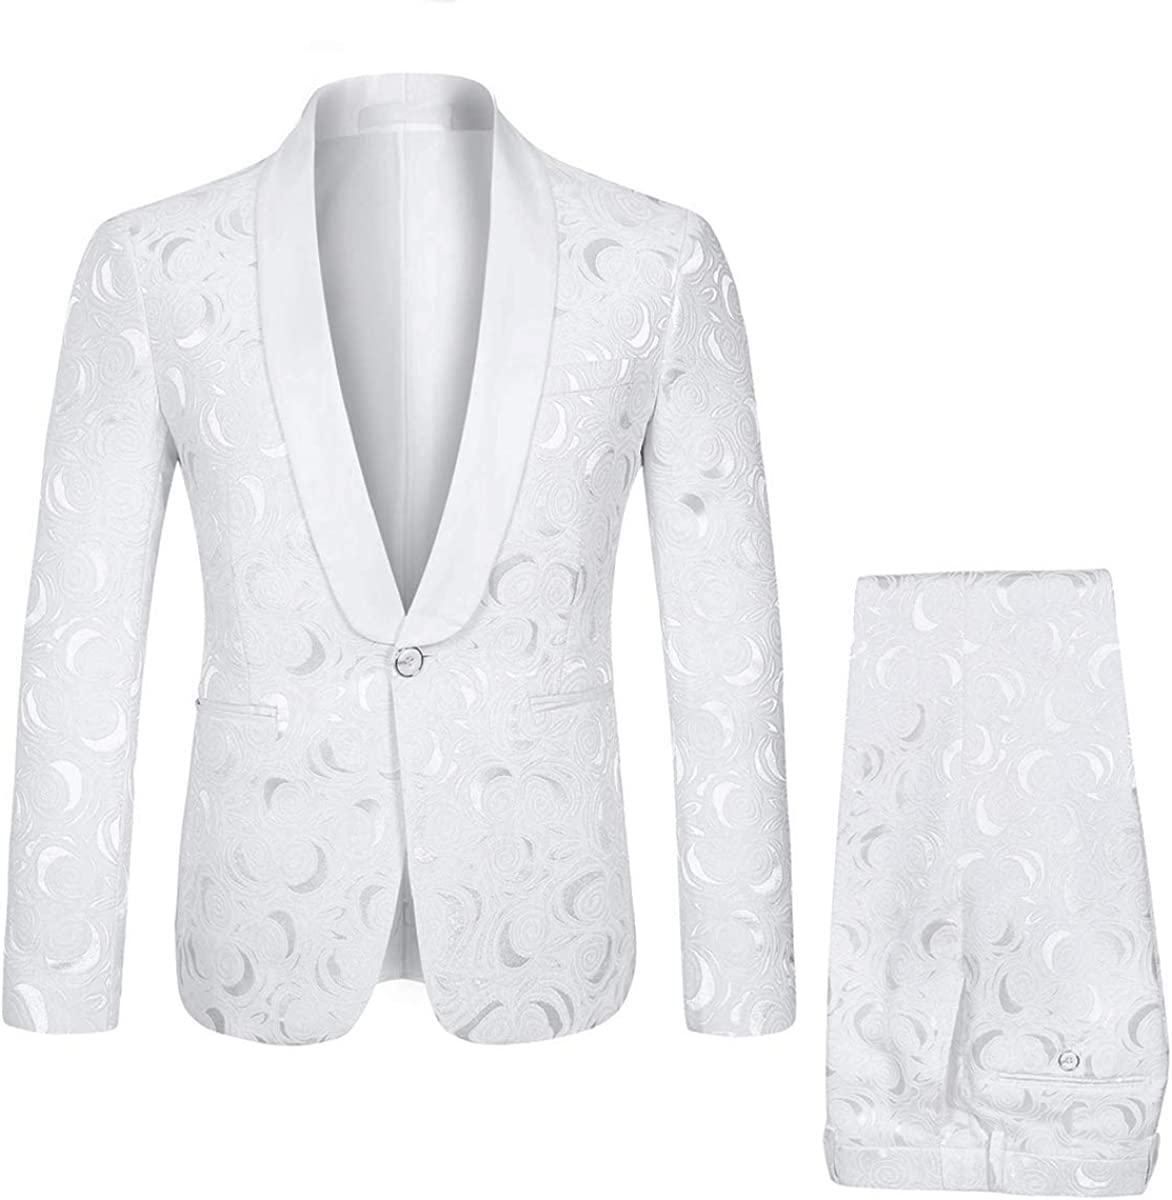 Frank Men's One Button White Jacquard Suit Jacket Pants Wedding Suits Groom Tuxedos